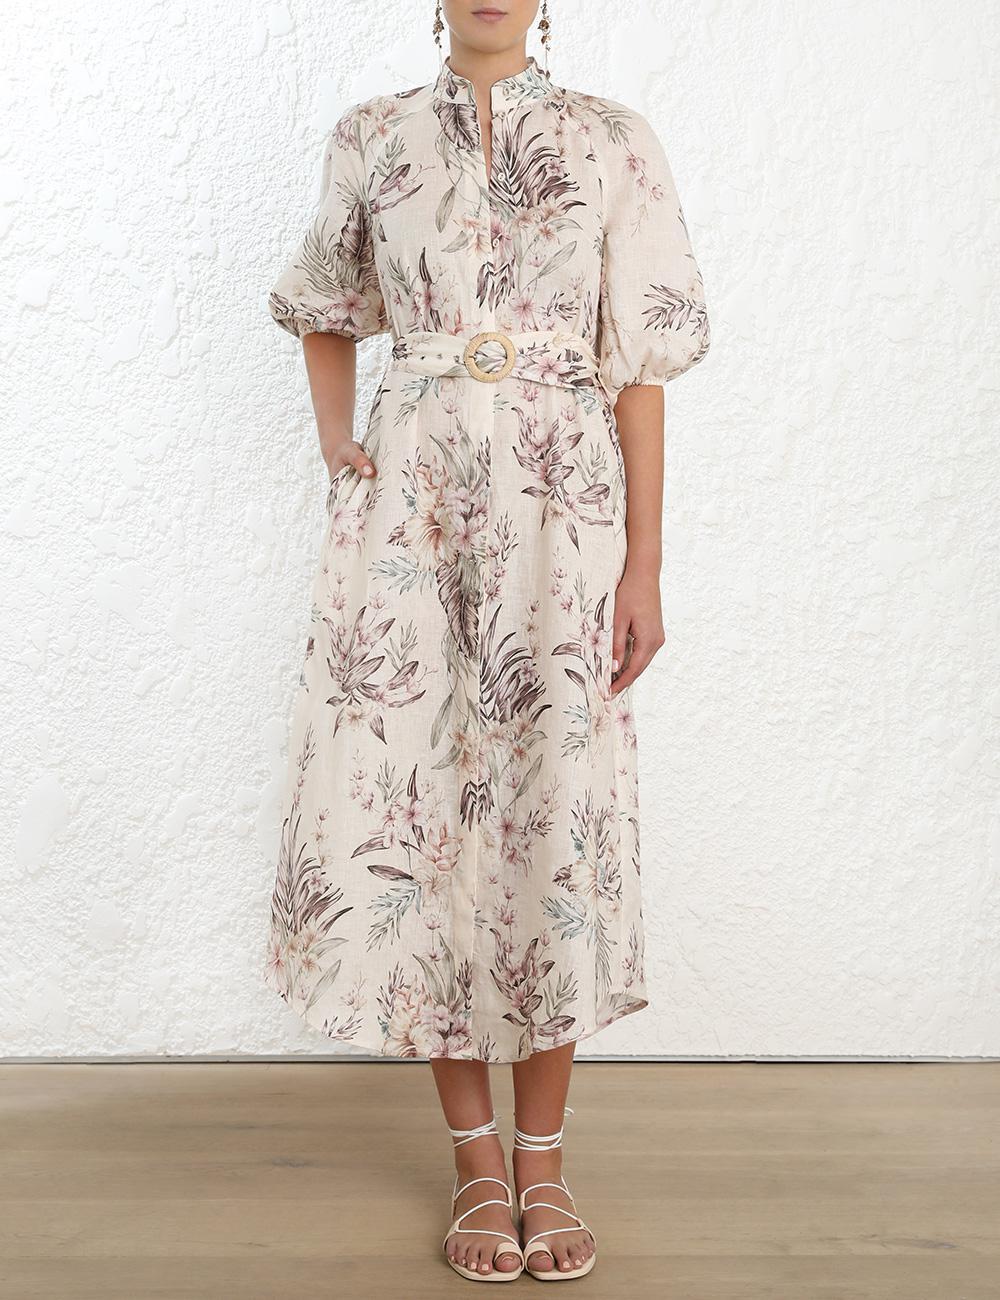 263ed10b89 Lyst - Zimmermann Tropical Print Dress - Save 12%